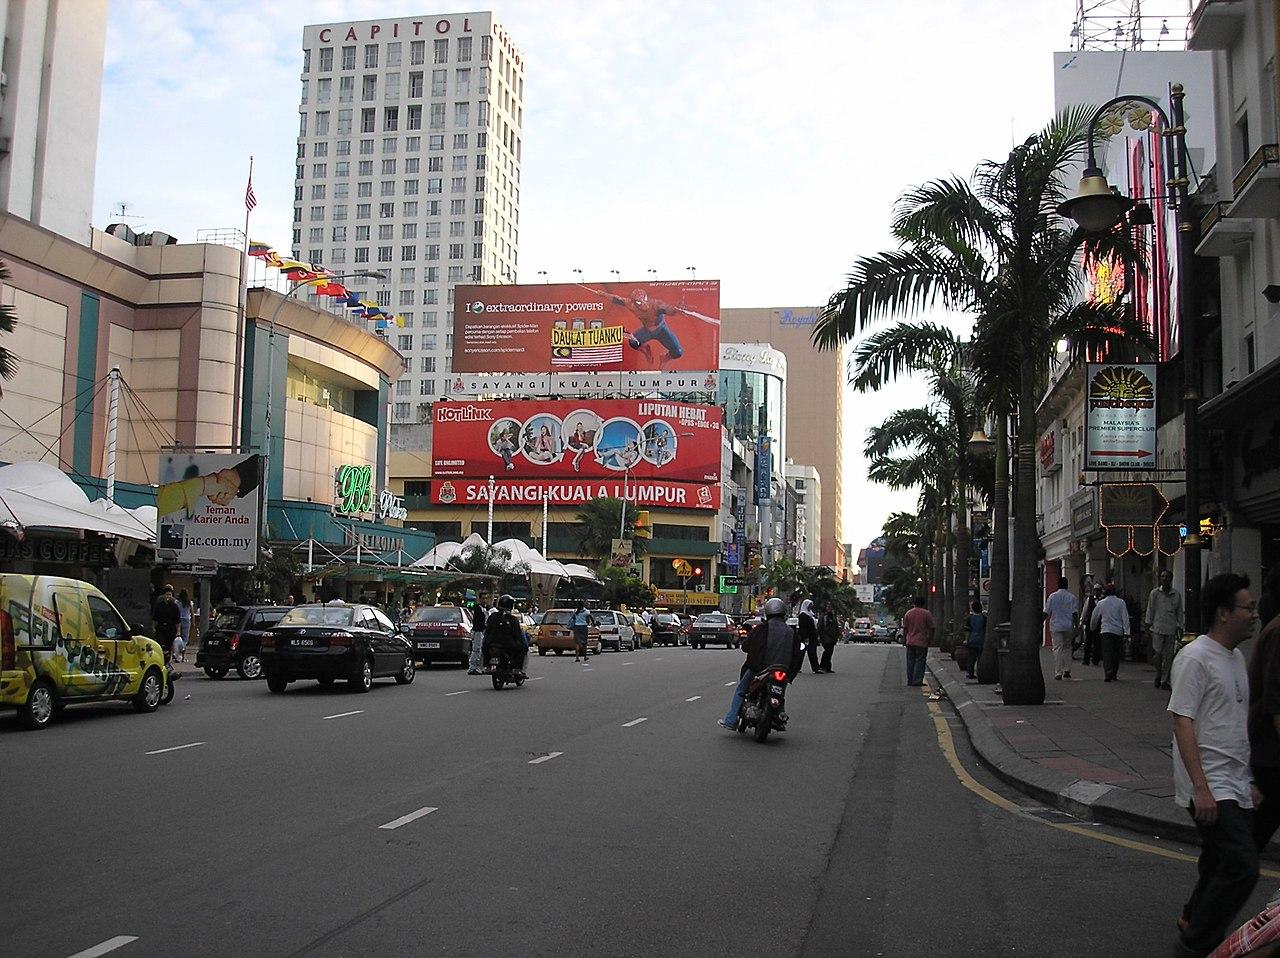 Roads in Kuala Lumpur images